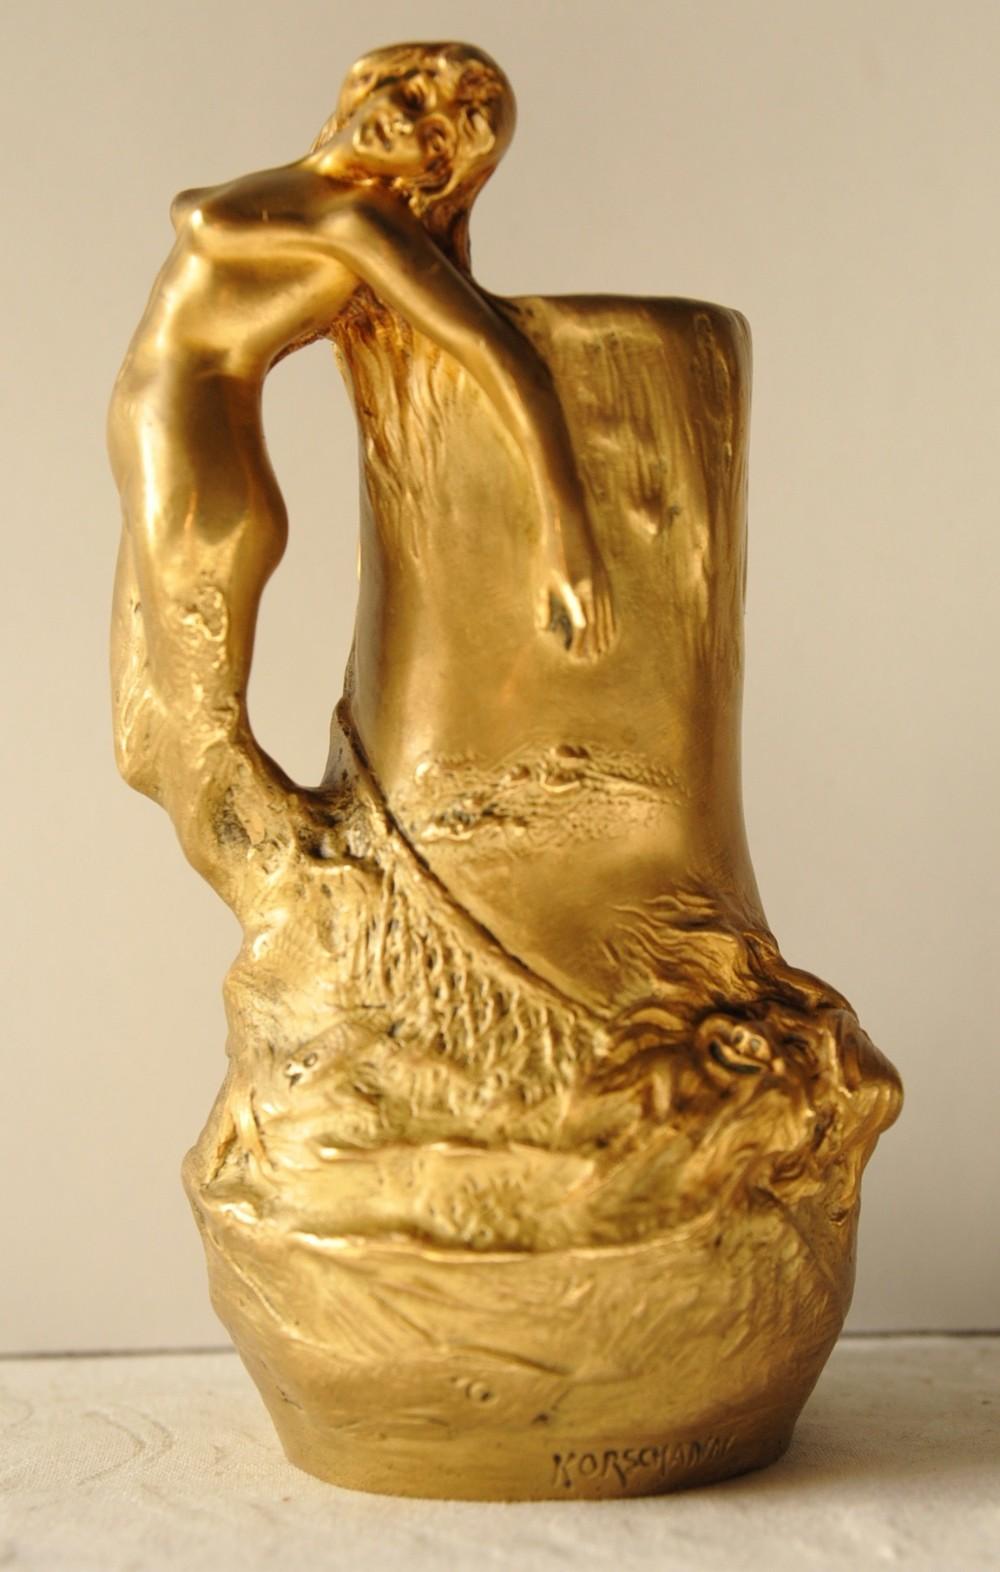 french art nouveau gilt bronze figural vase by charles korschann